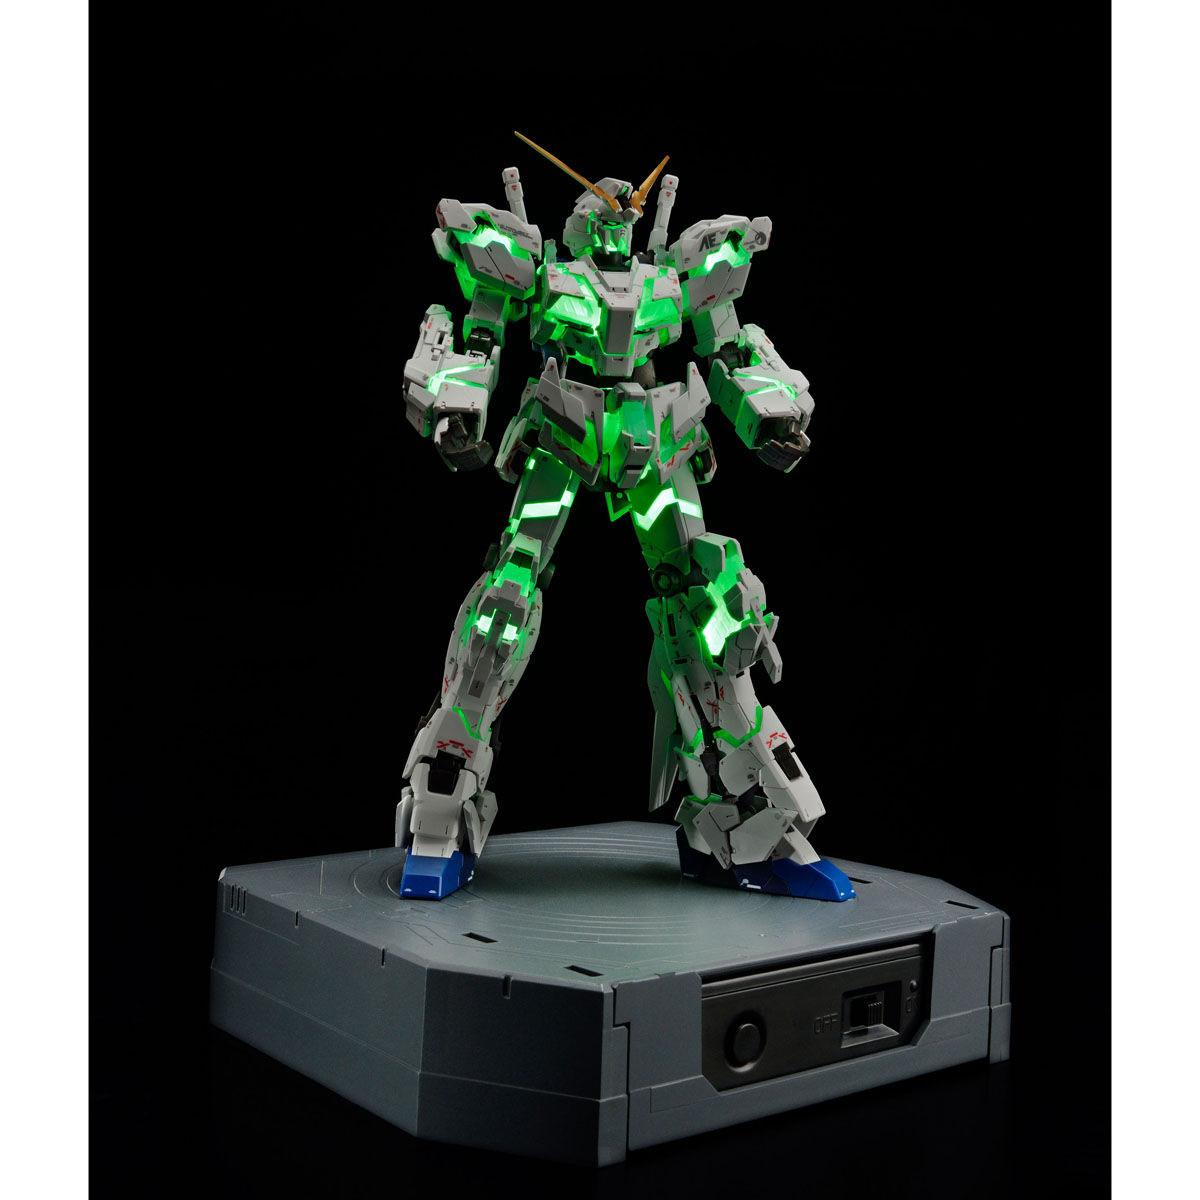 RG 1/144『ガンダムベース限定 RX-0 ユニコーンガンダム(デストロイモード)Ver.TWC(LIGHTING MODEL)』プラモデル-003